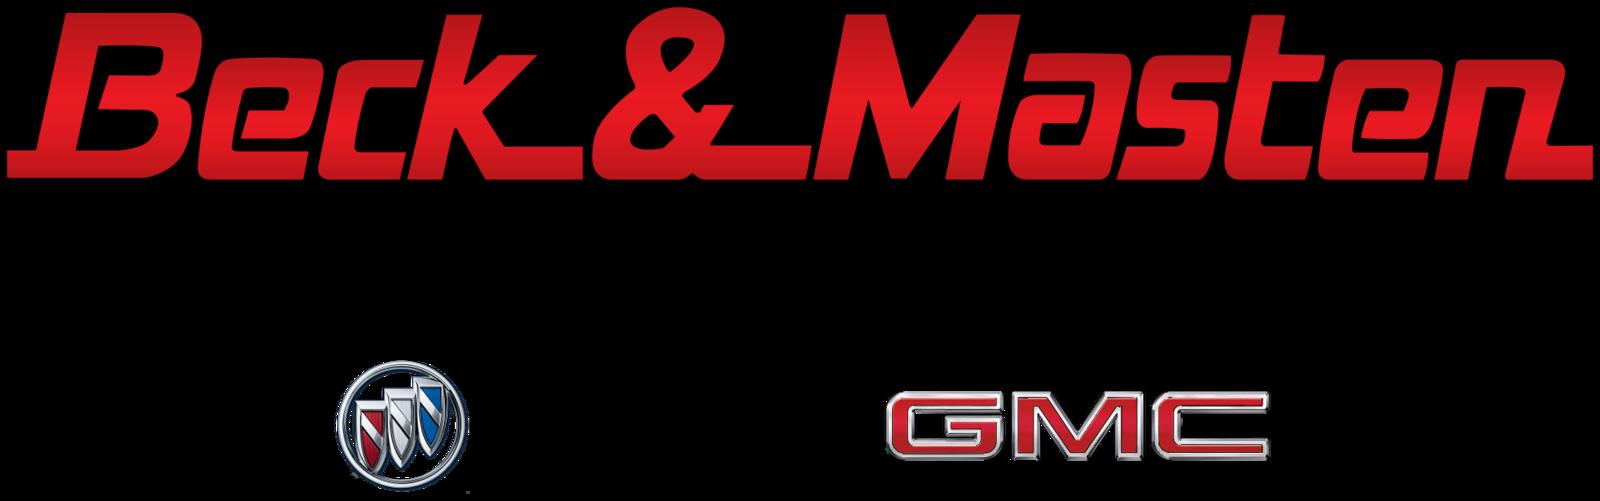 Used Car Dealers Corpus Christi >> Beck & Masten Buick GMC Coastal Bend - Robstown, TX: Read ...